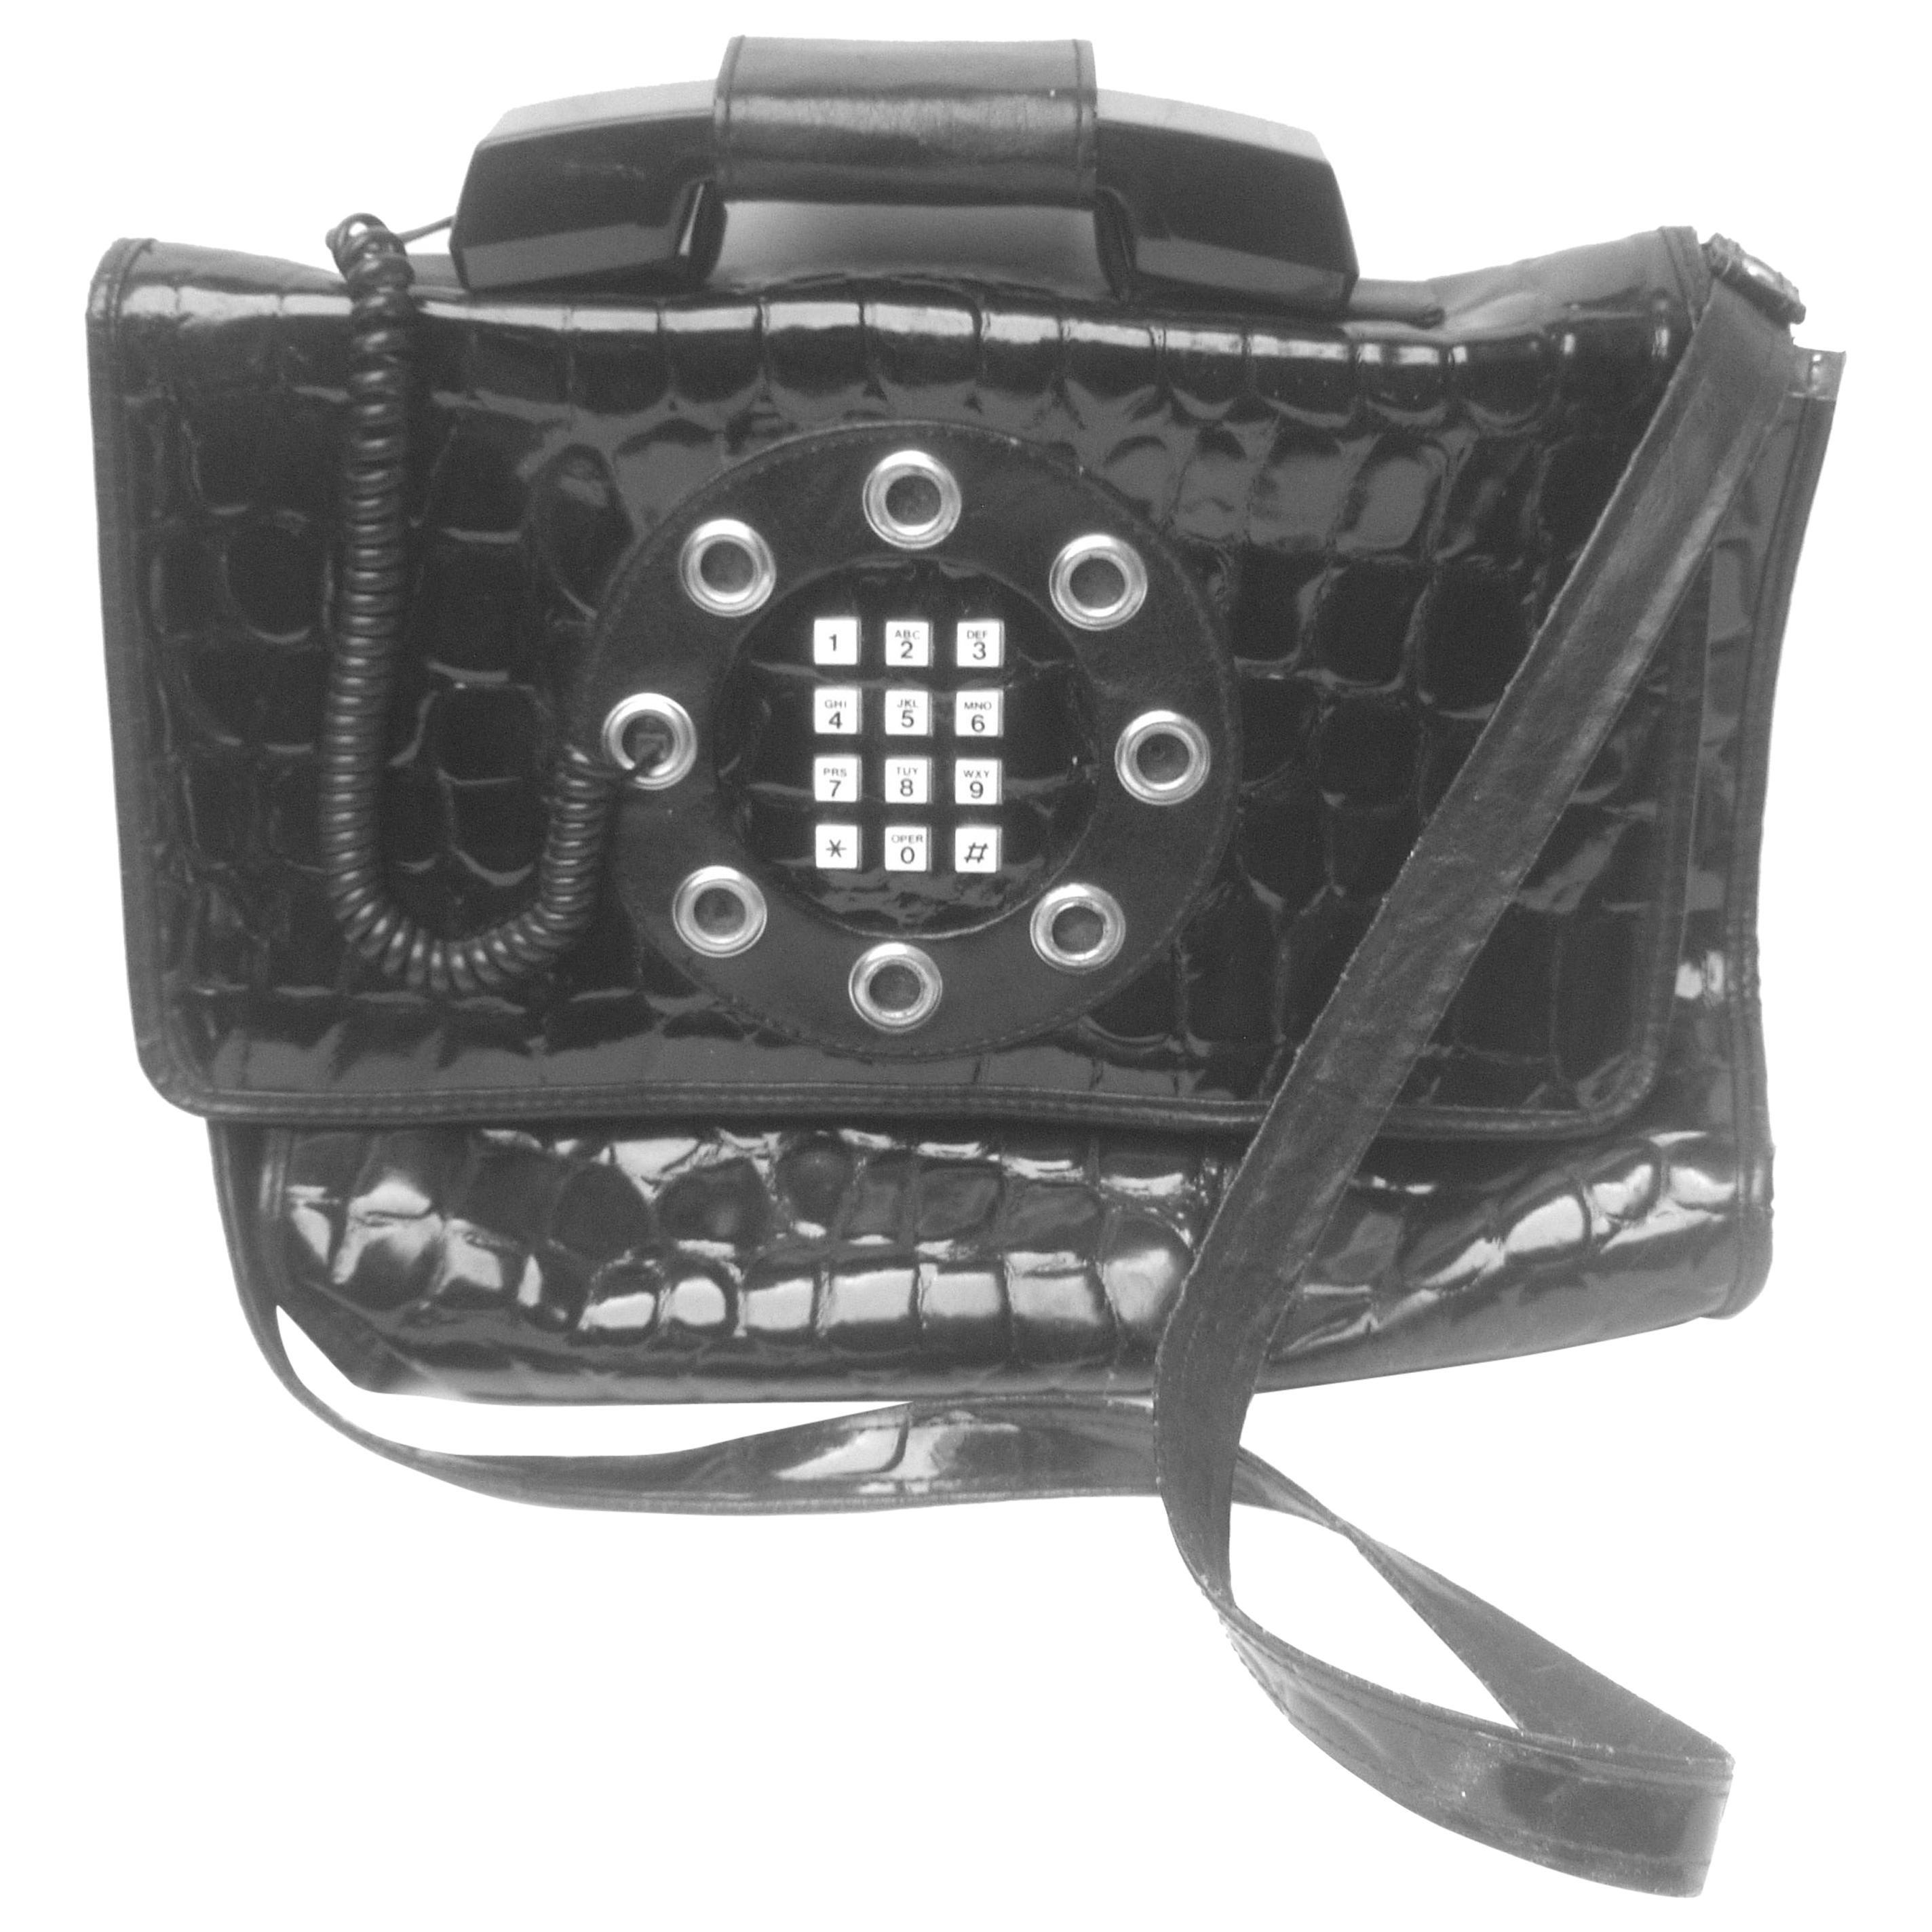 Mod Embossed Black Vinyl Telephone Shoulder Bag c 1980s